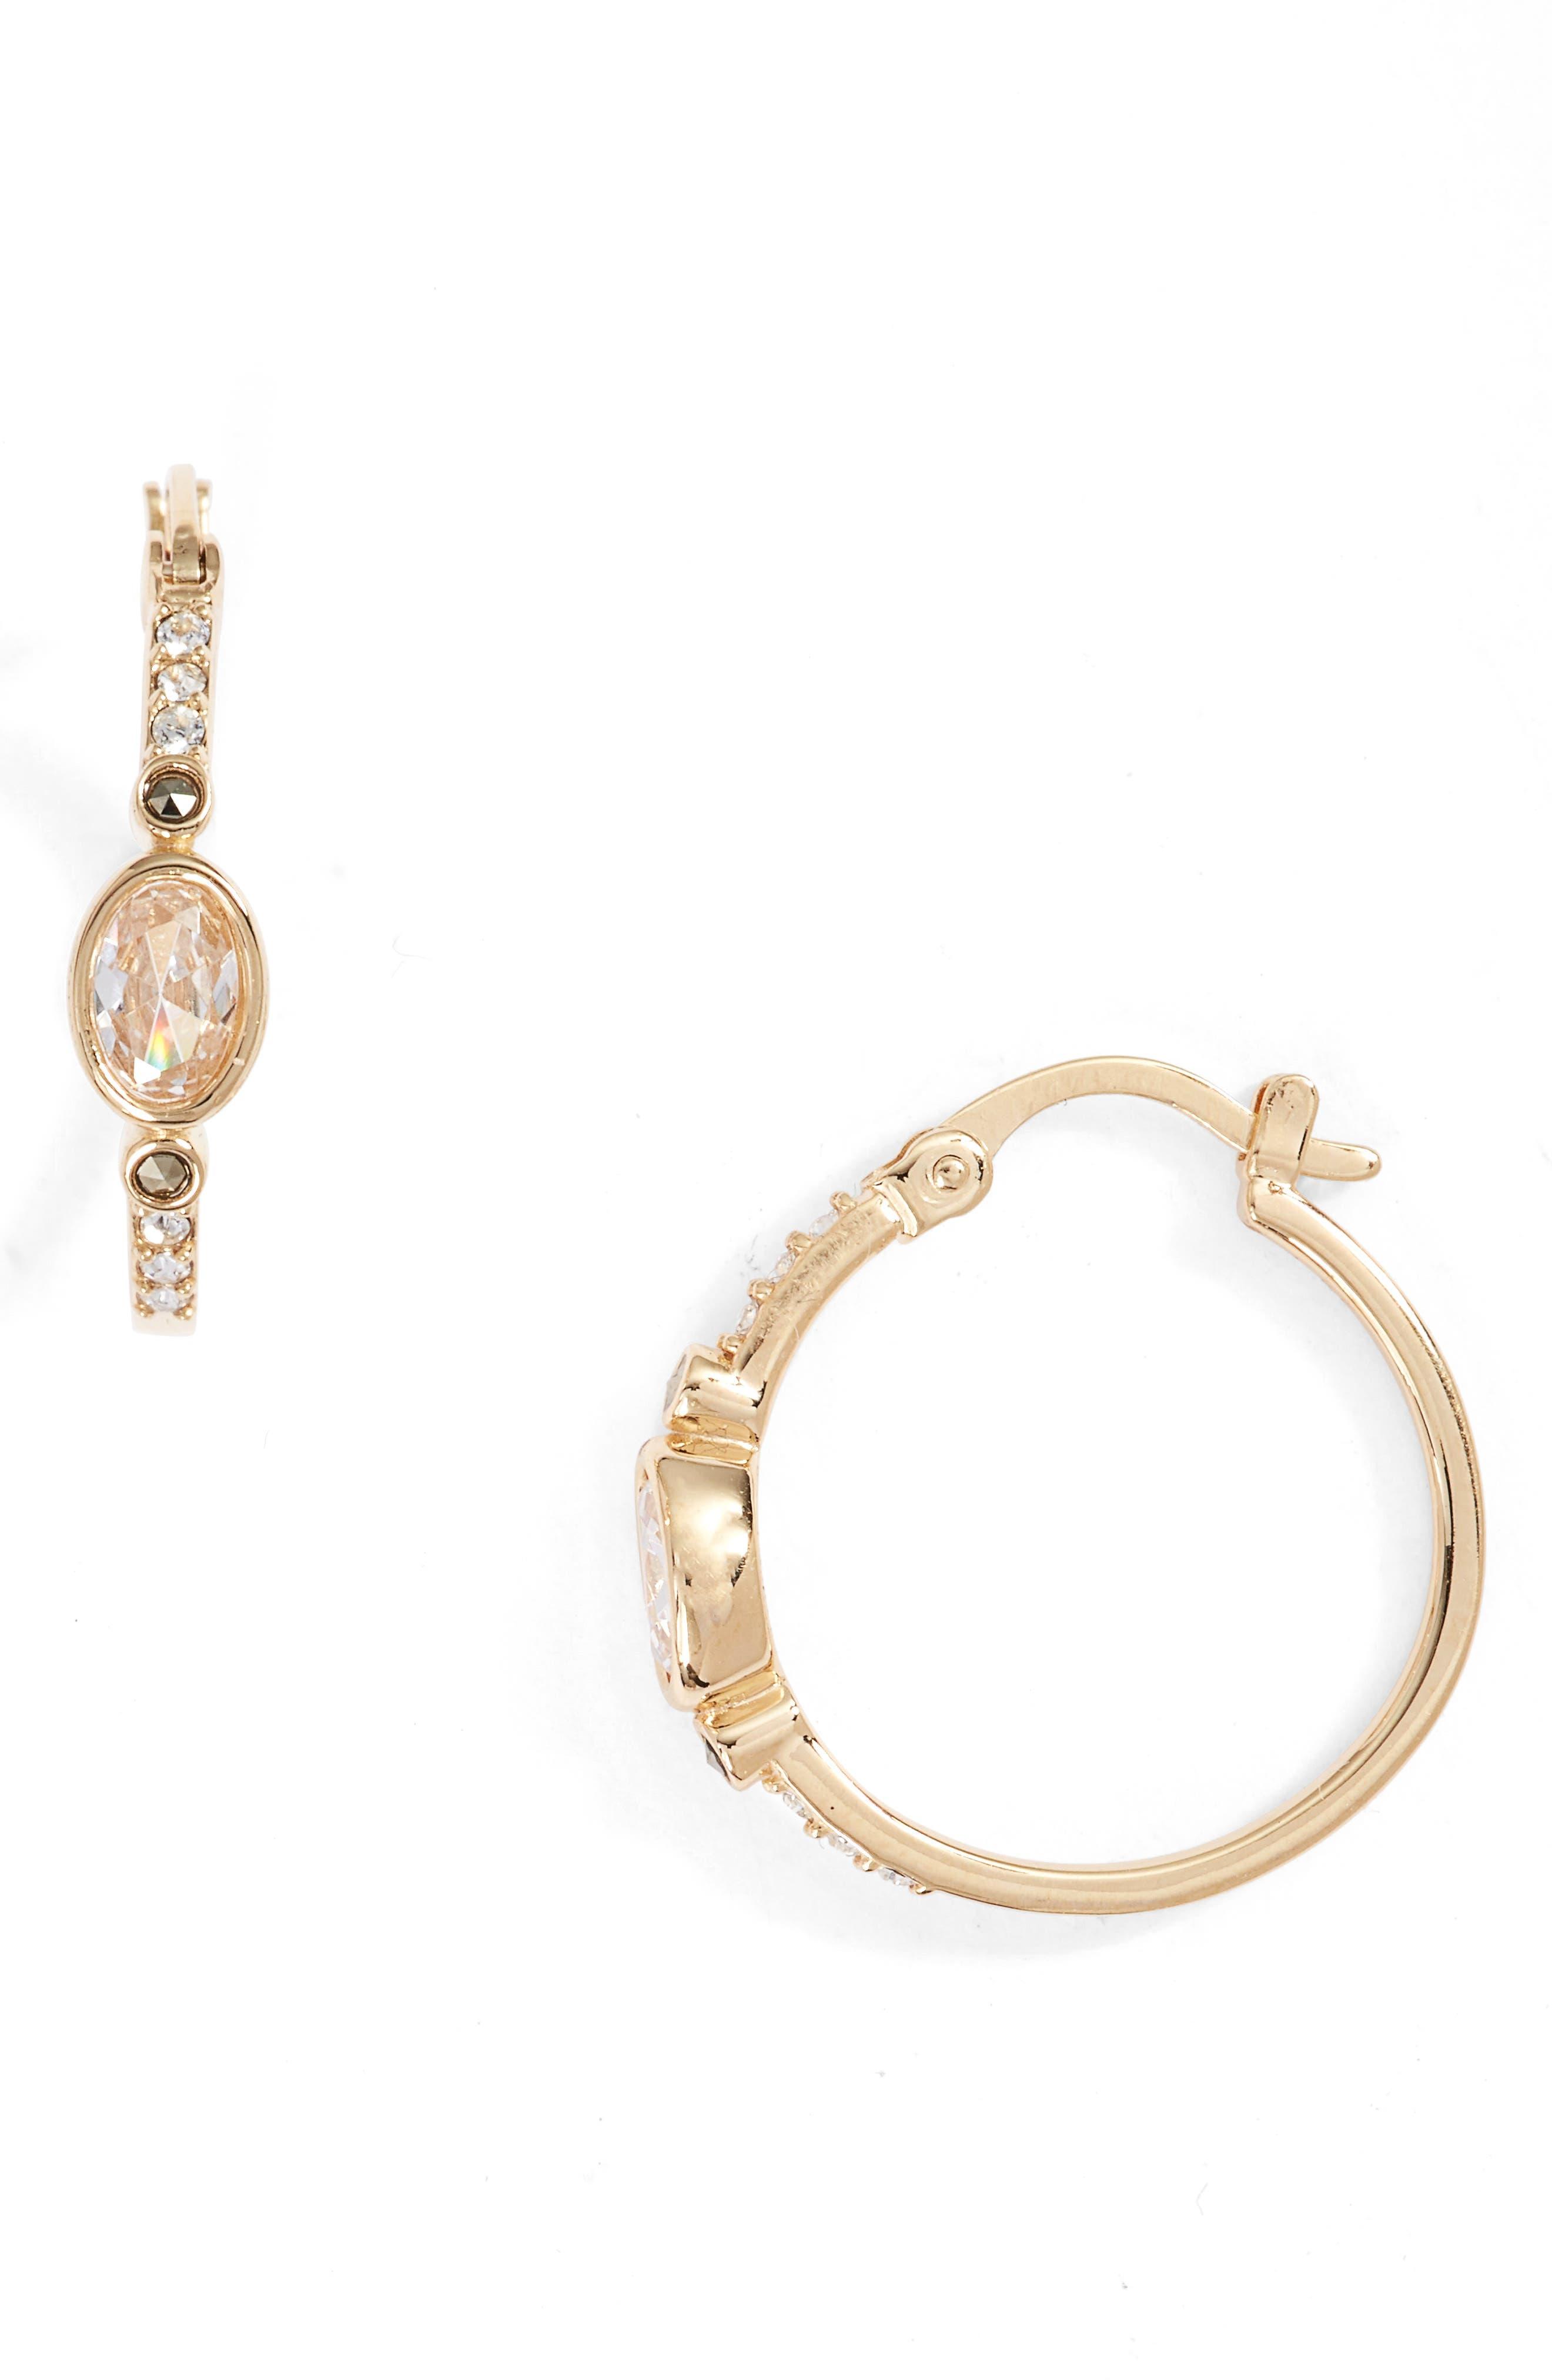 JUDITH JACK Semiprecious Stone Hoop Earrings